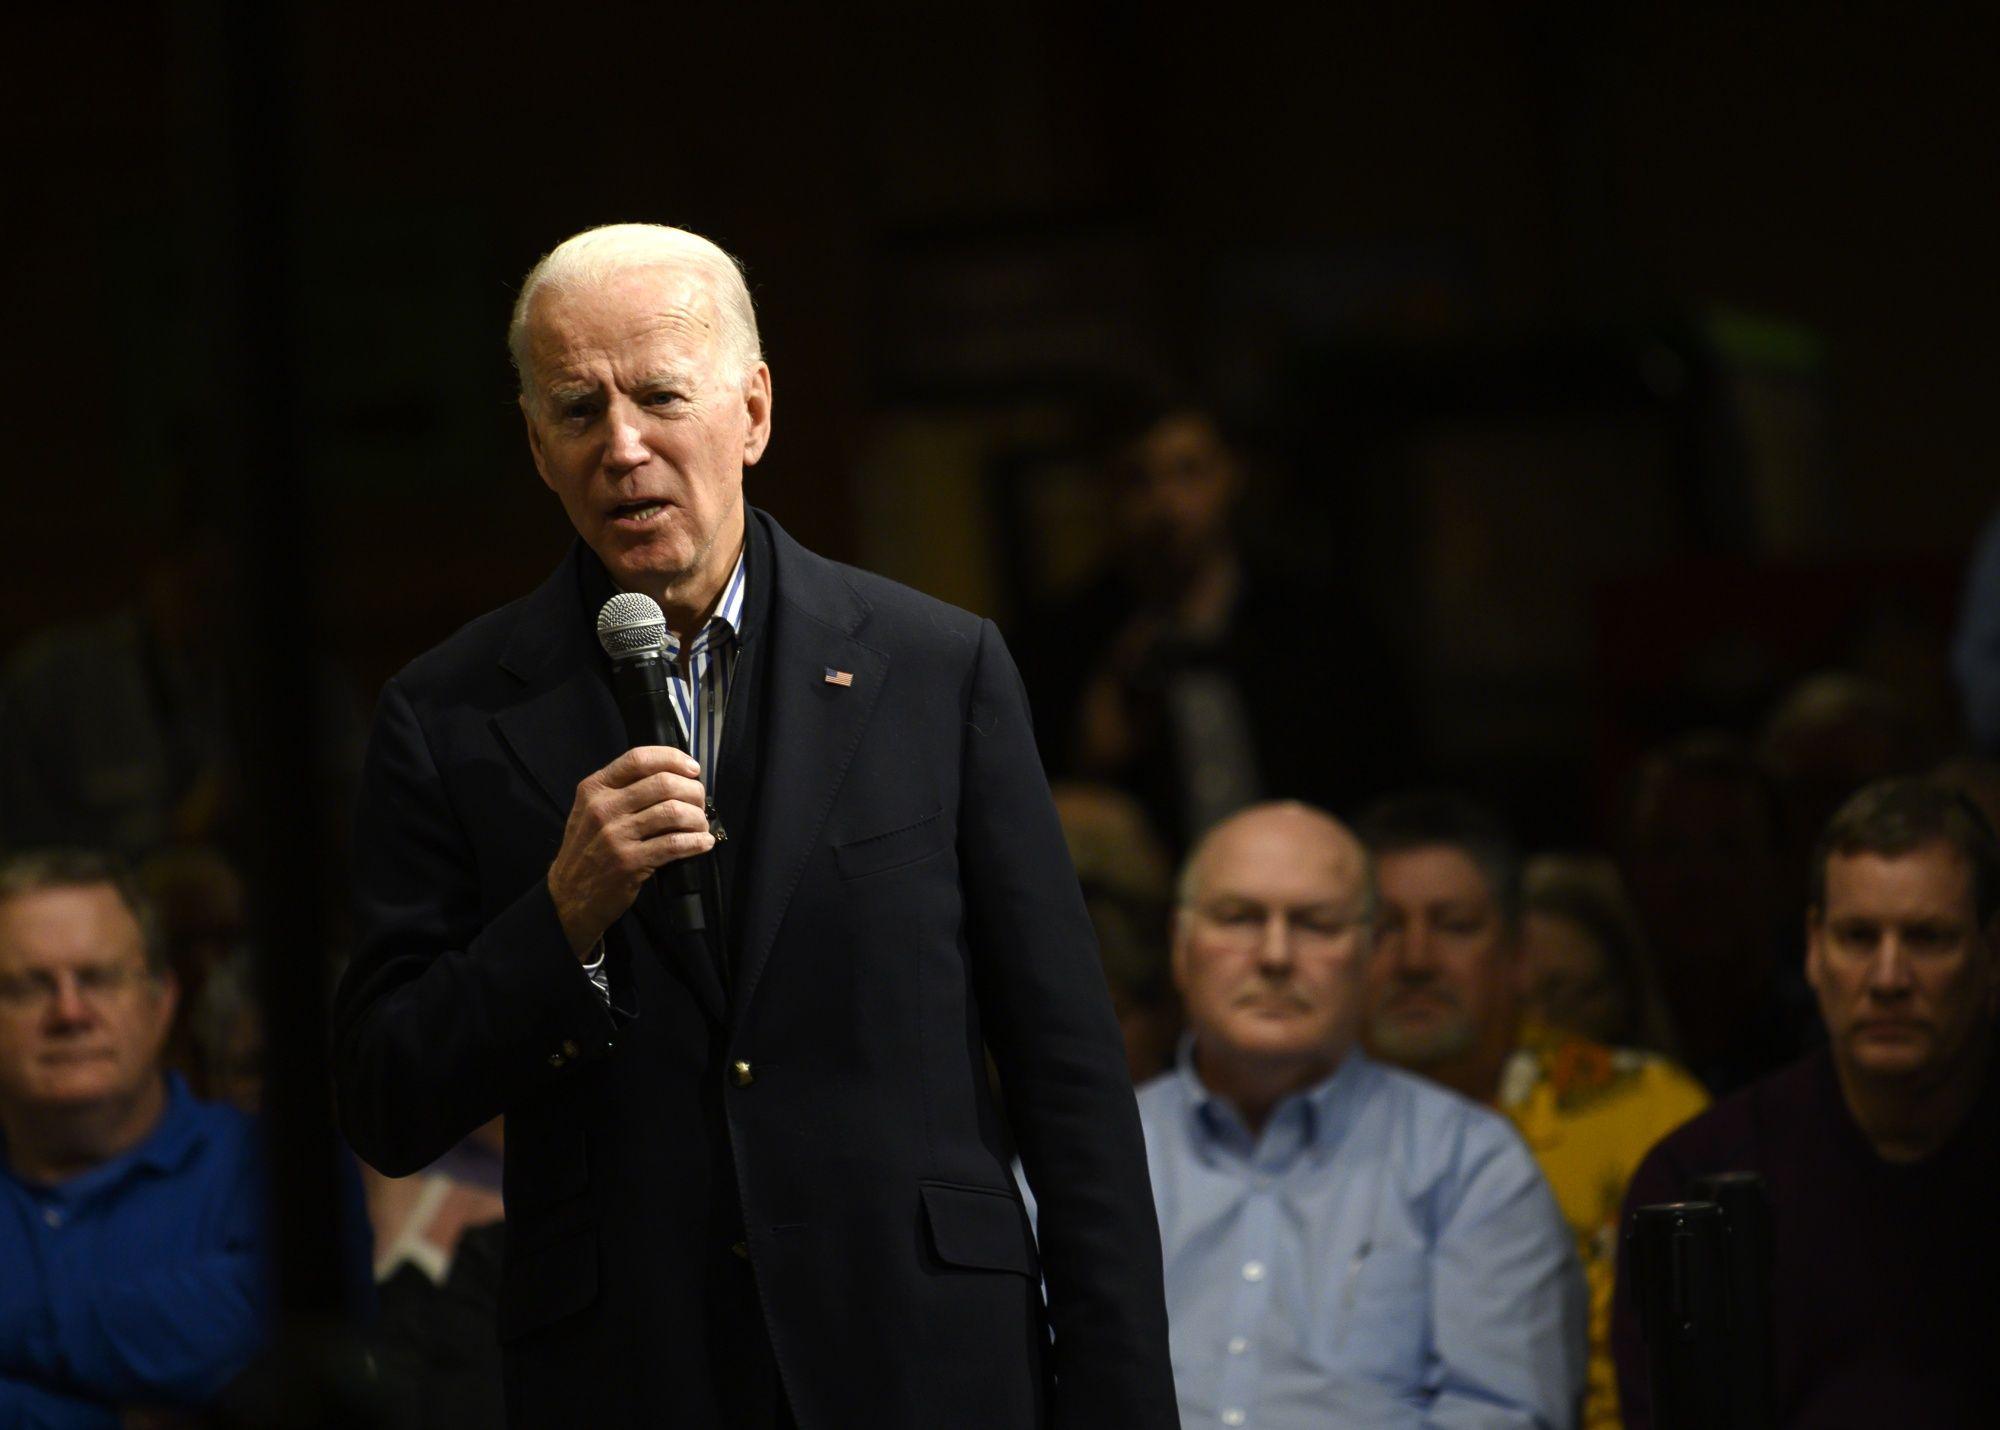 Biden Defends Foreign Policy Record Amid Trump Iran Threats